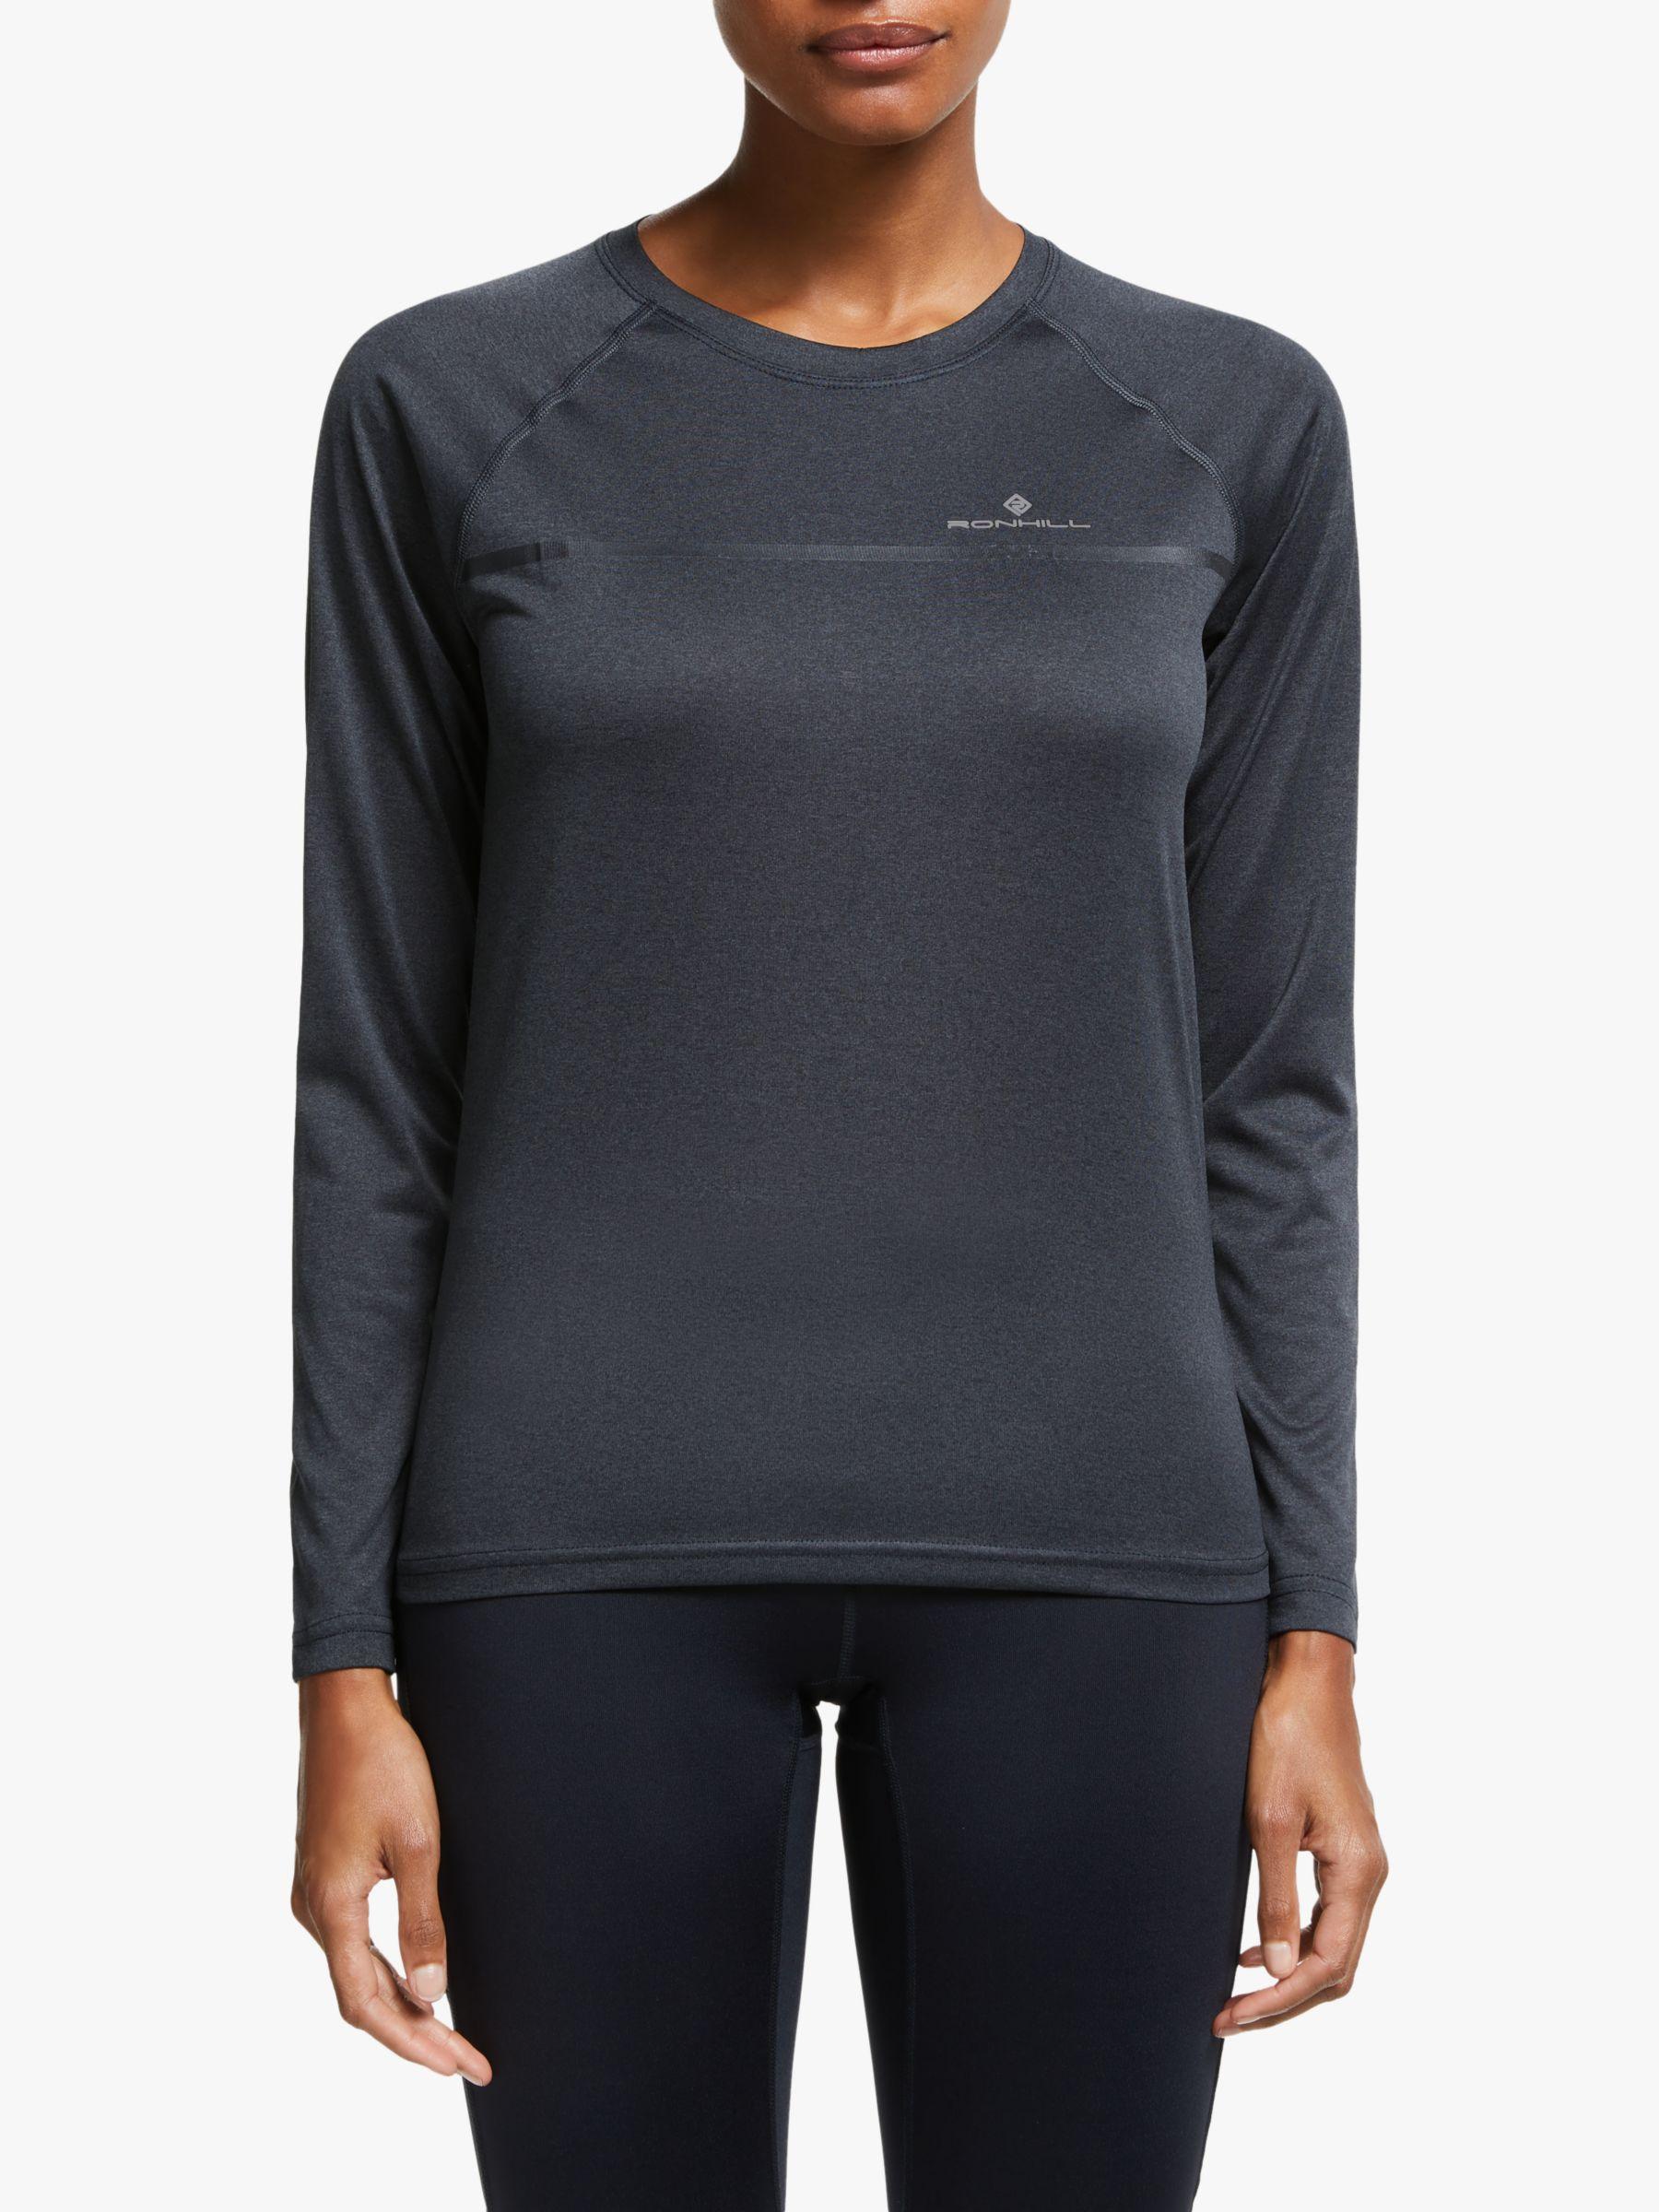 Grey Ronhill Everyday Long Sleeve Womens Running Top